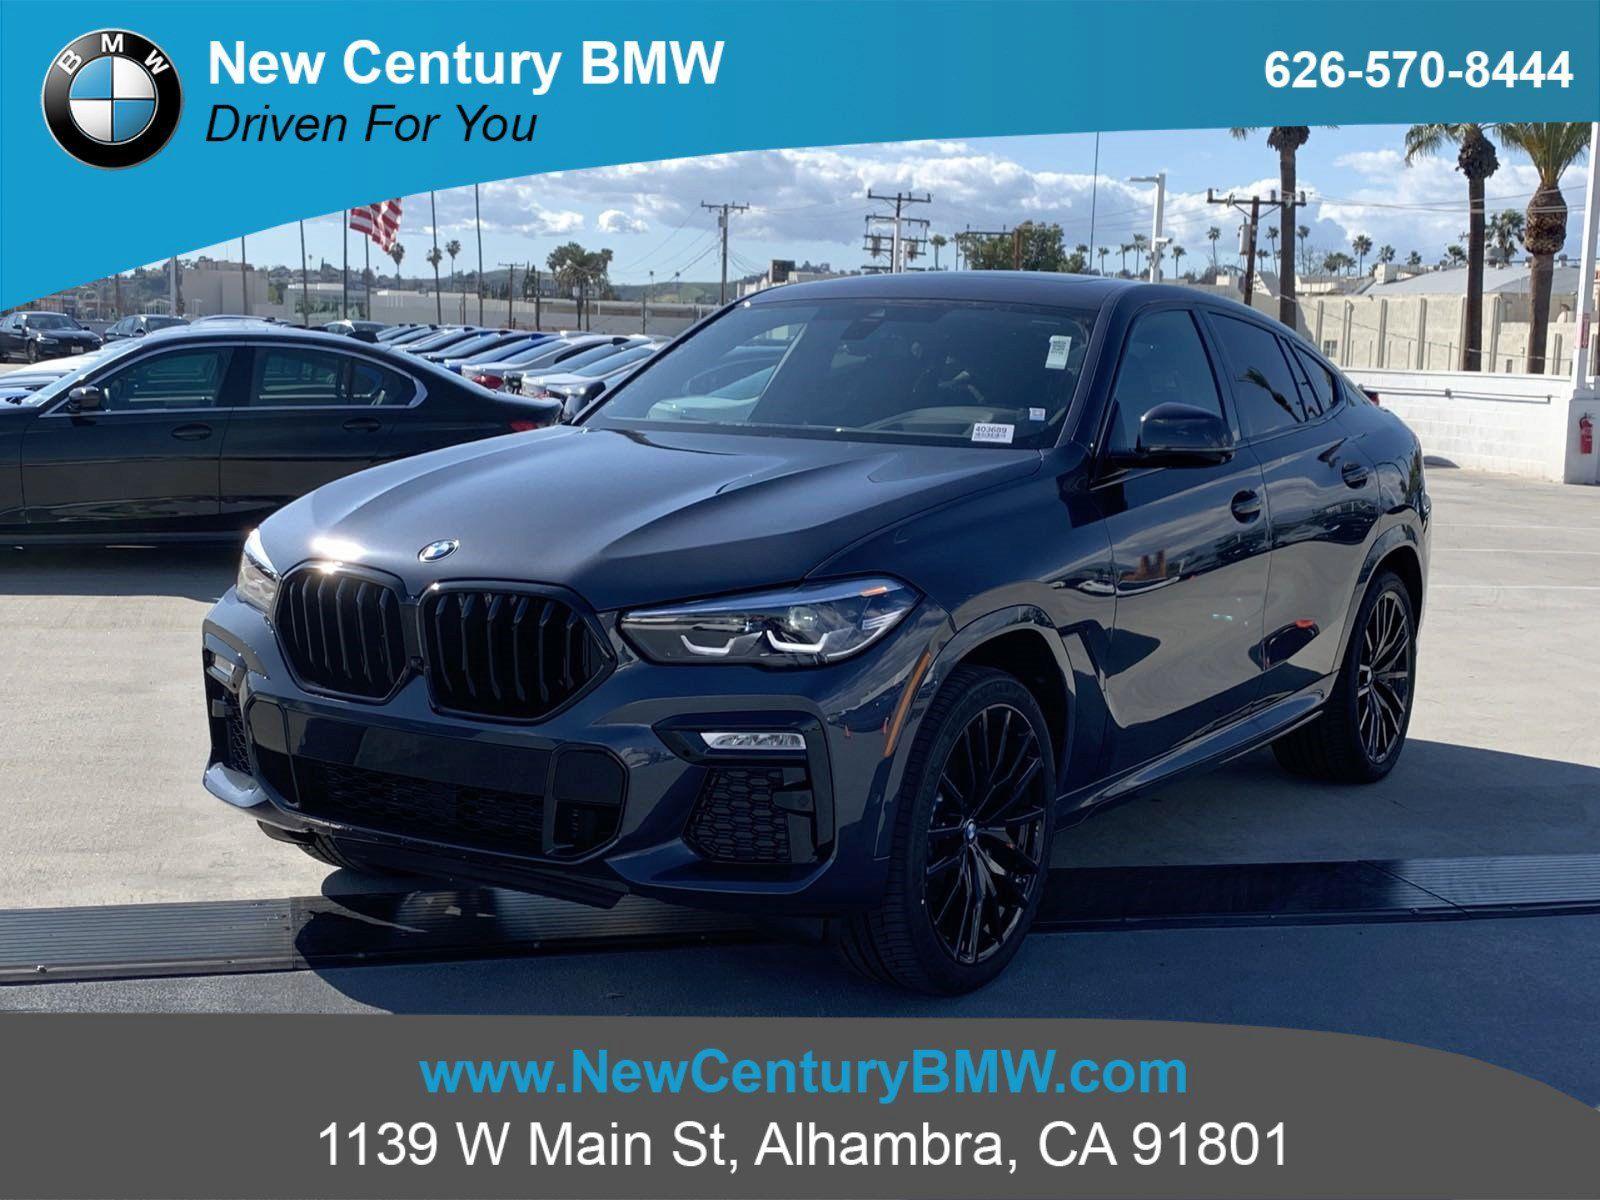 New 2020 Bmw X6 For Sale Near Montebello Ca New Century Bmw